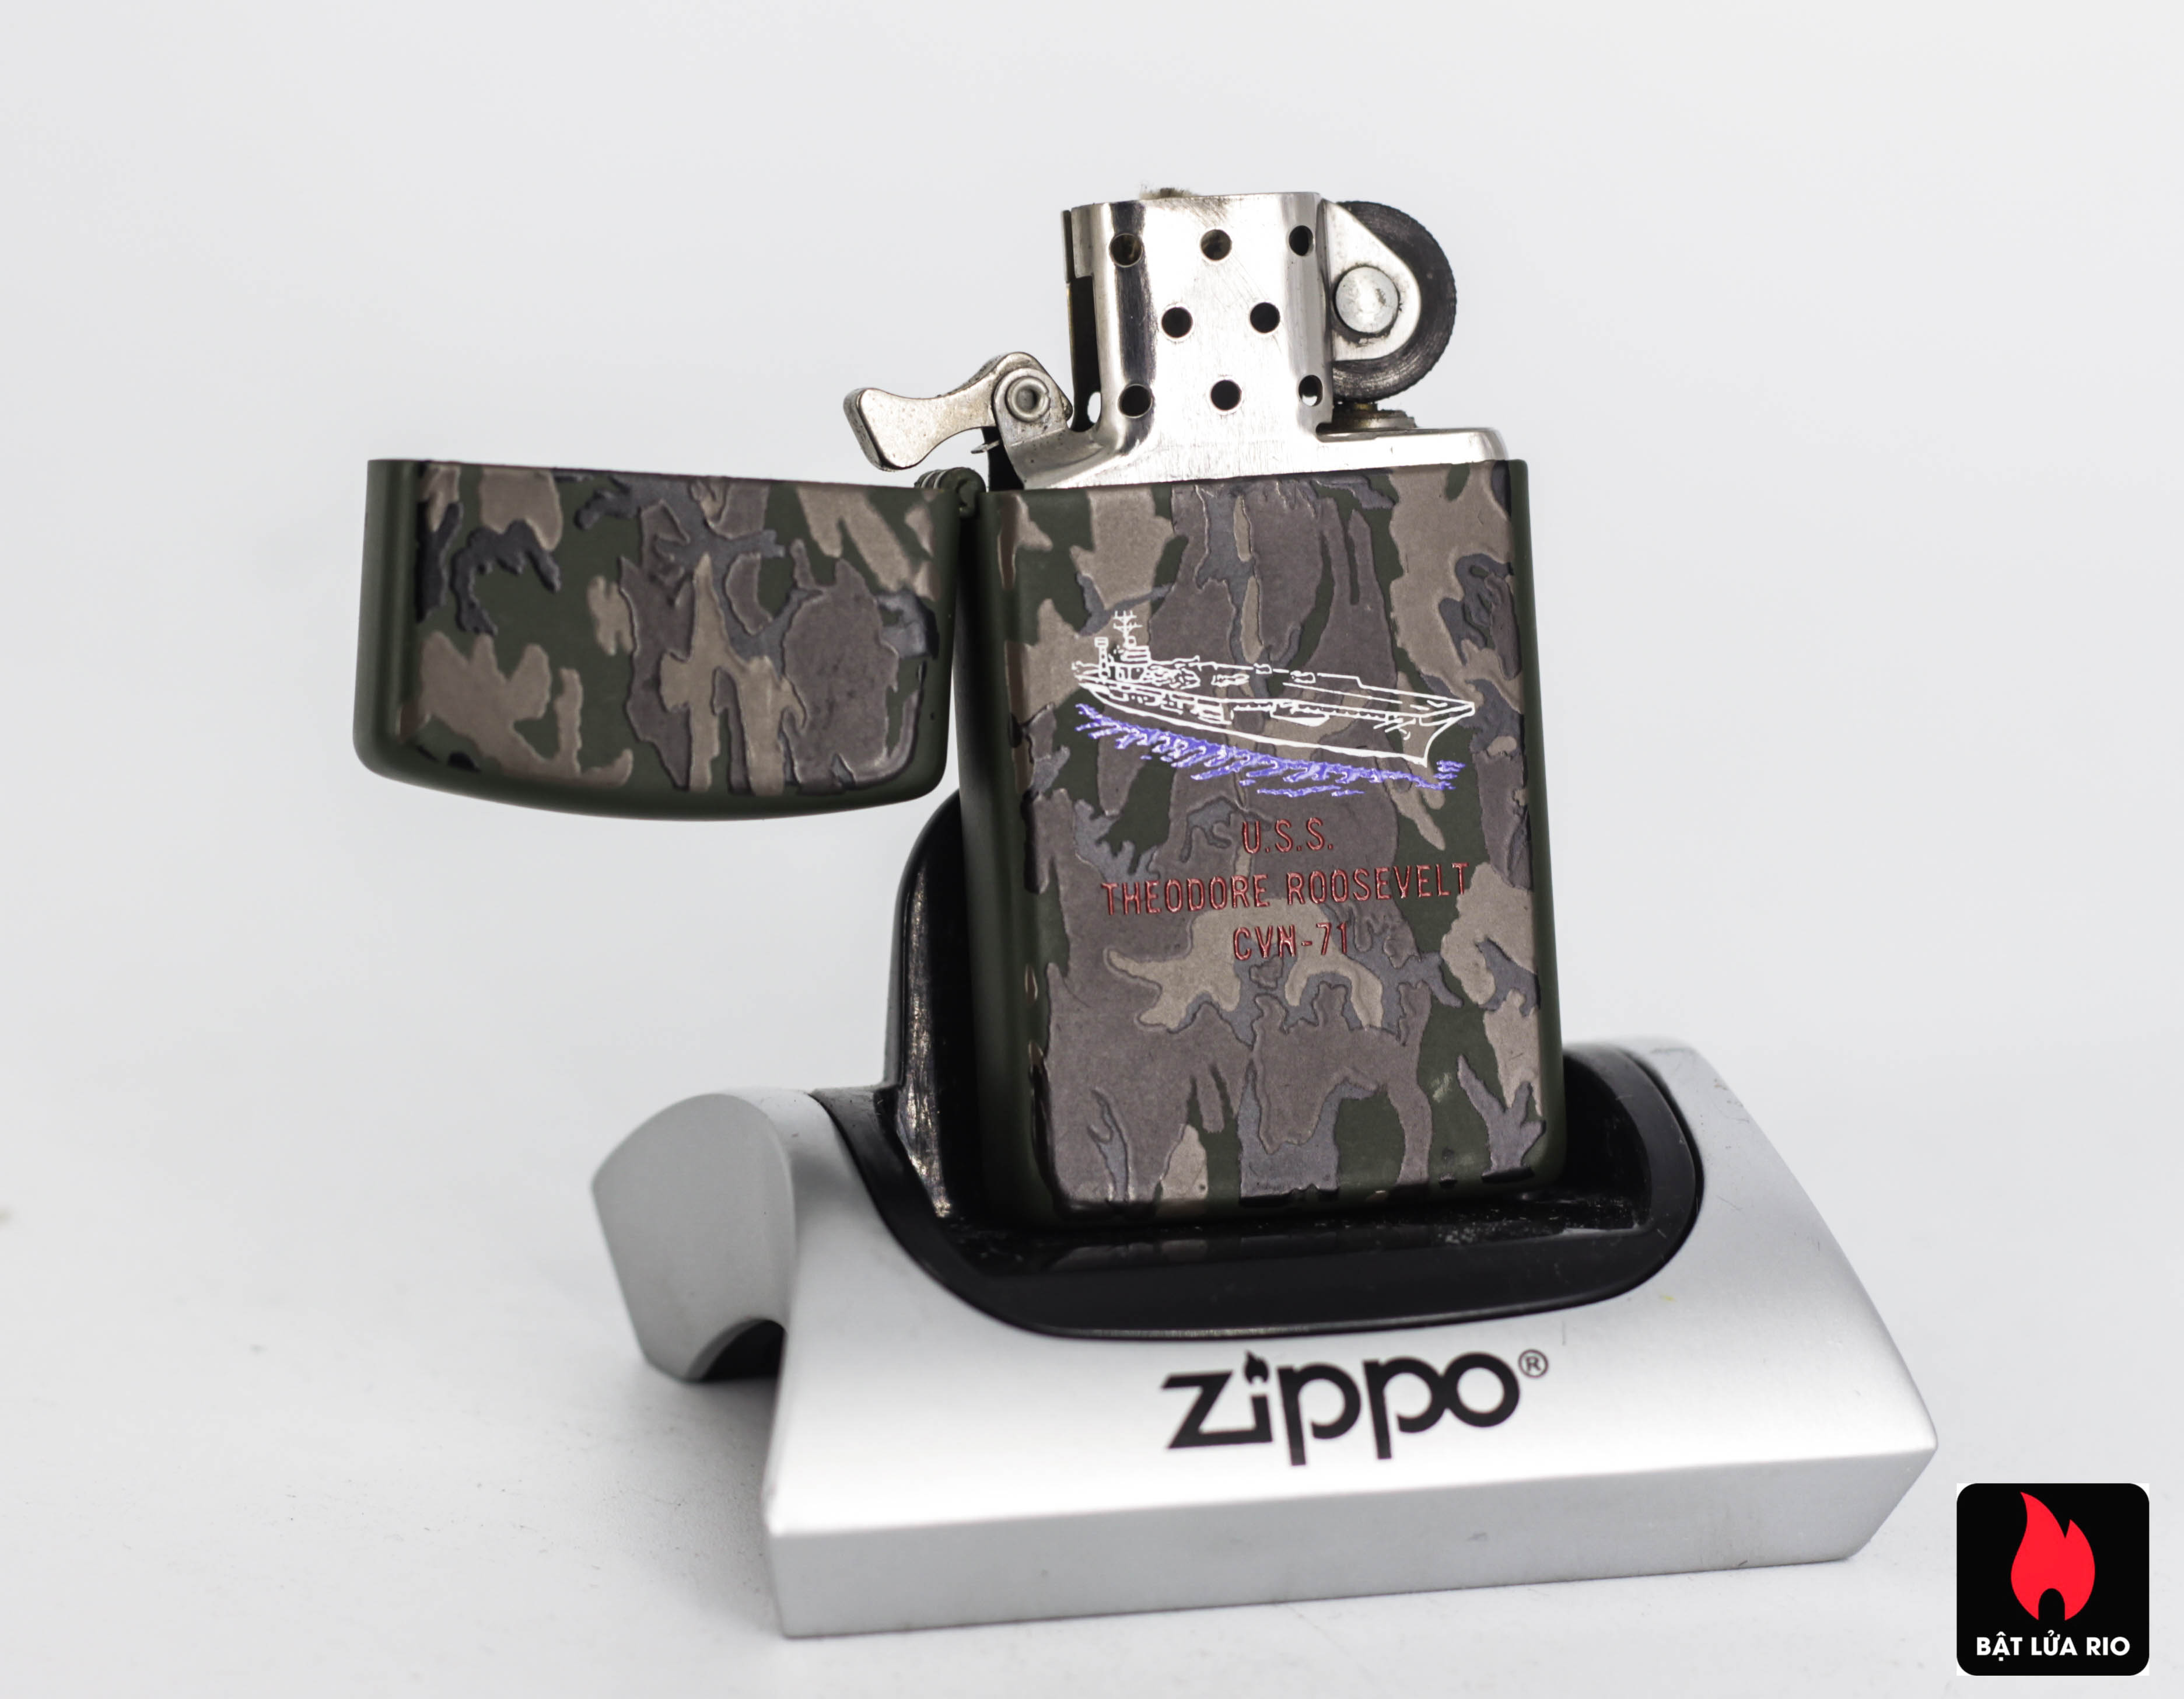 Zippo Slim 1992 - Camo - Uss Theodore Roosevelt CVN 71 4